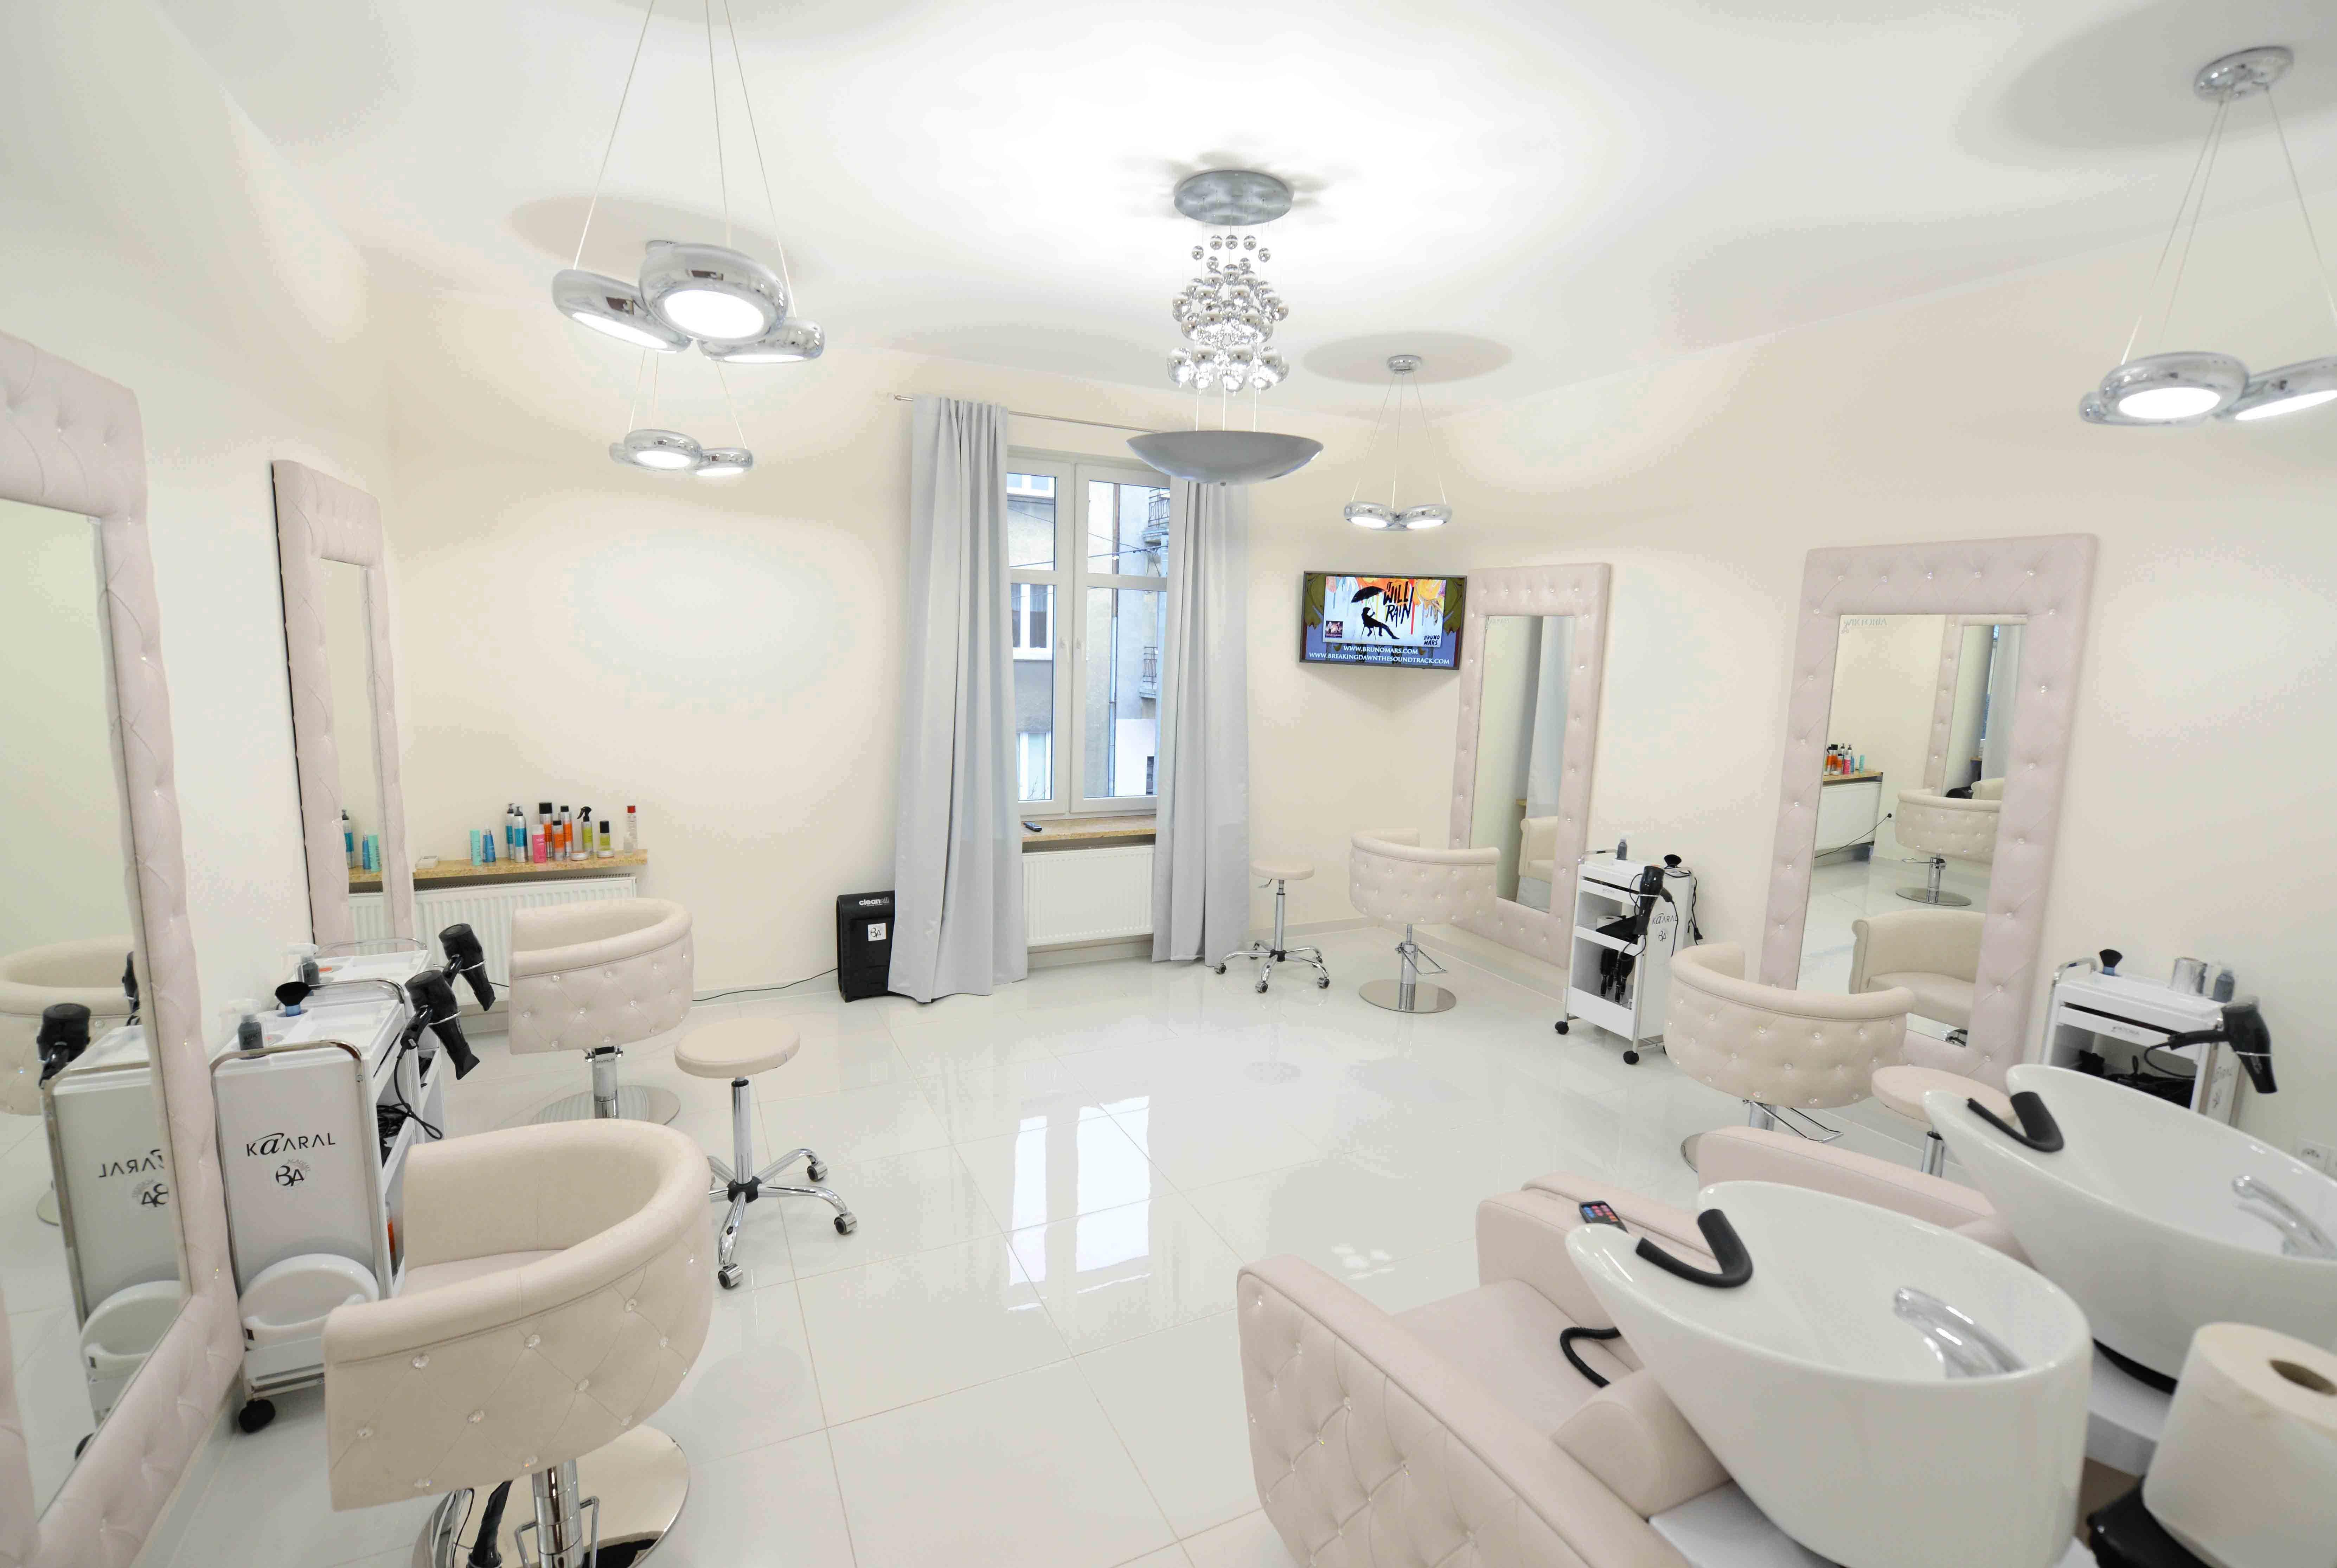 Hair Salon Studio Wiktoria P Poland Obesession Styling Chairs And Obsession Styling Units Made With Svarowski Crysta Salon Chairs Salon Design Salon Furniture